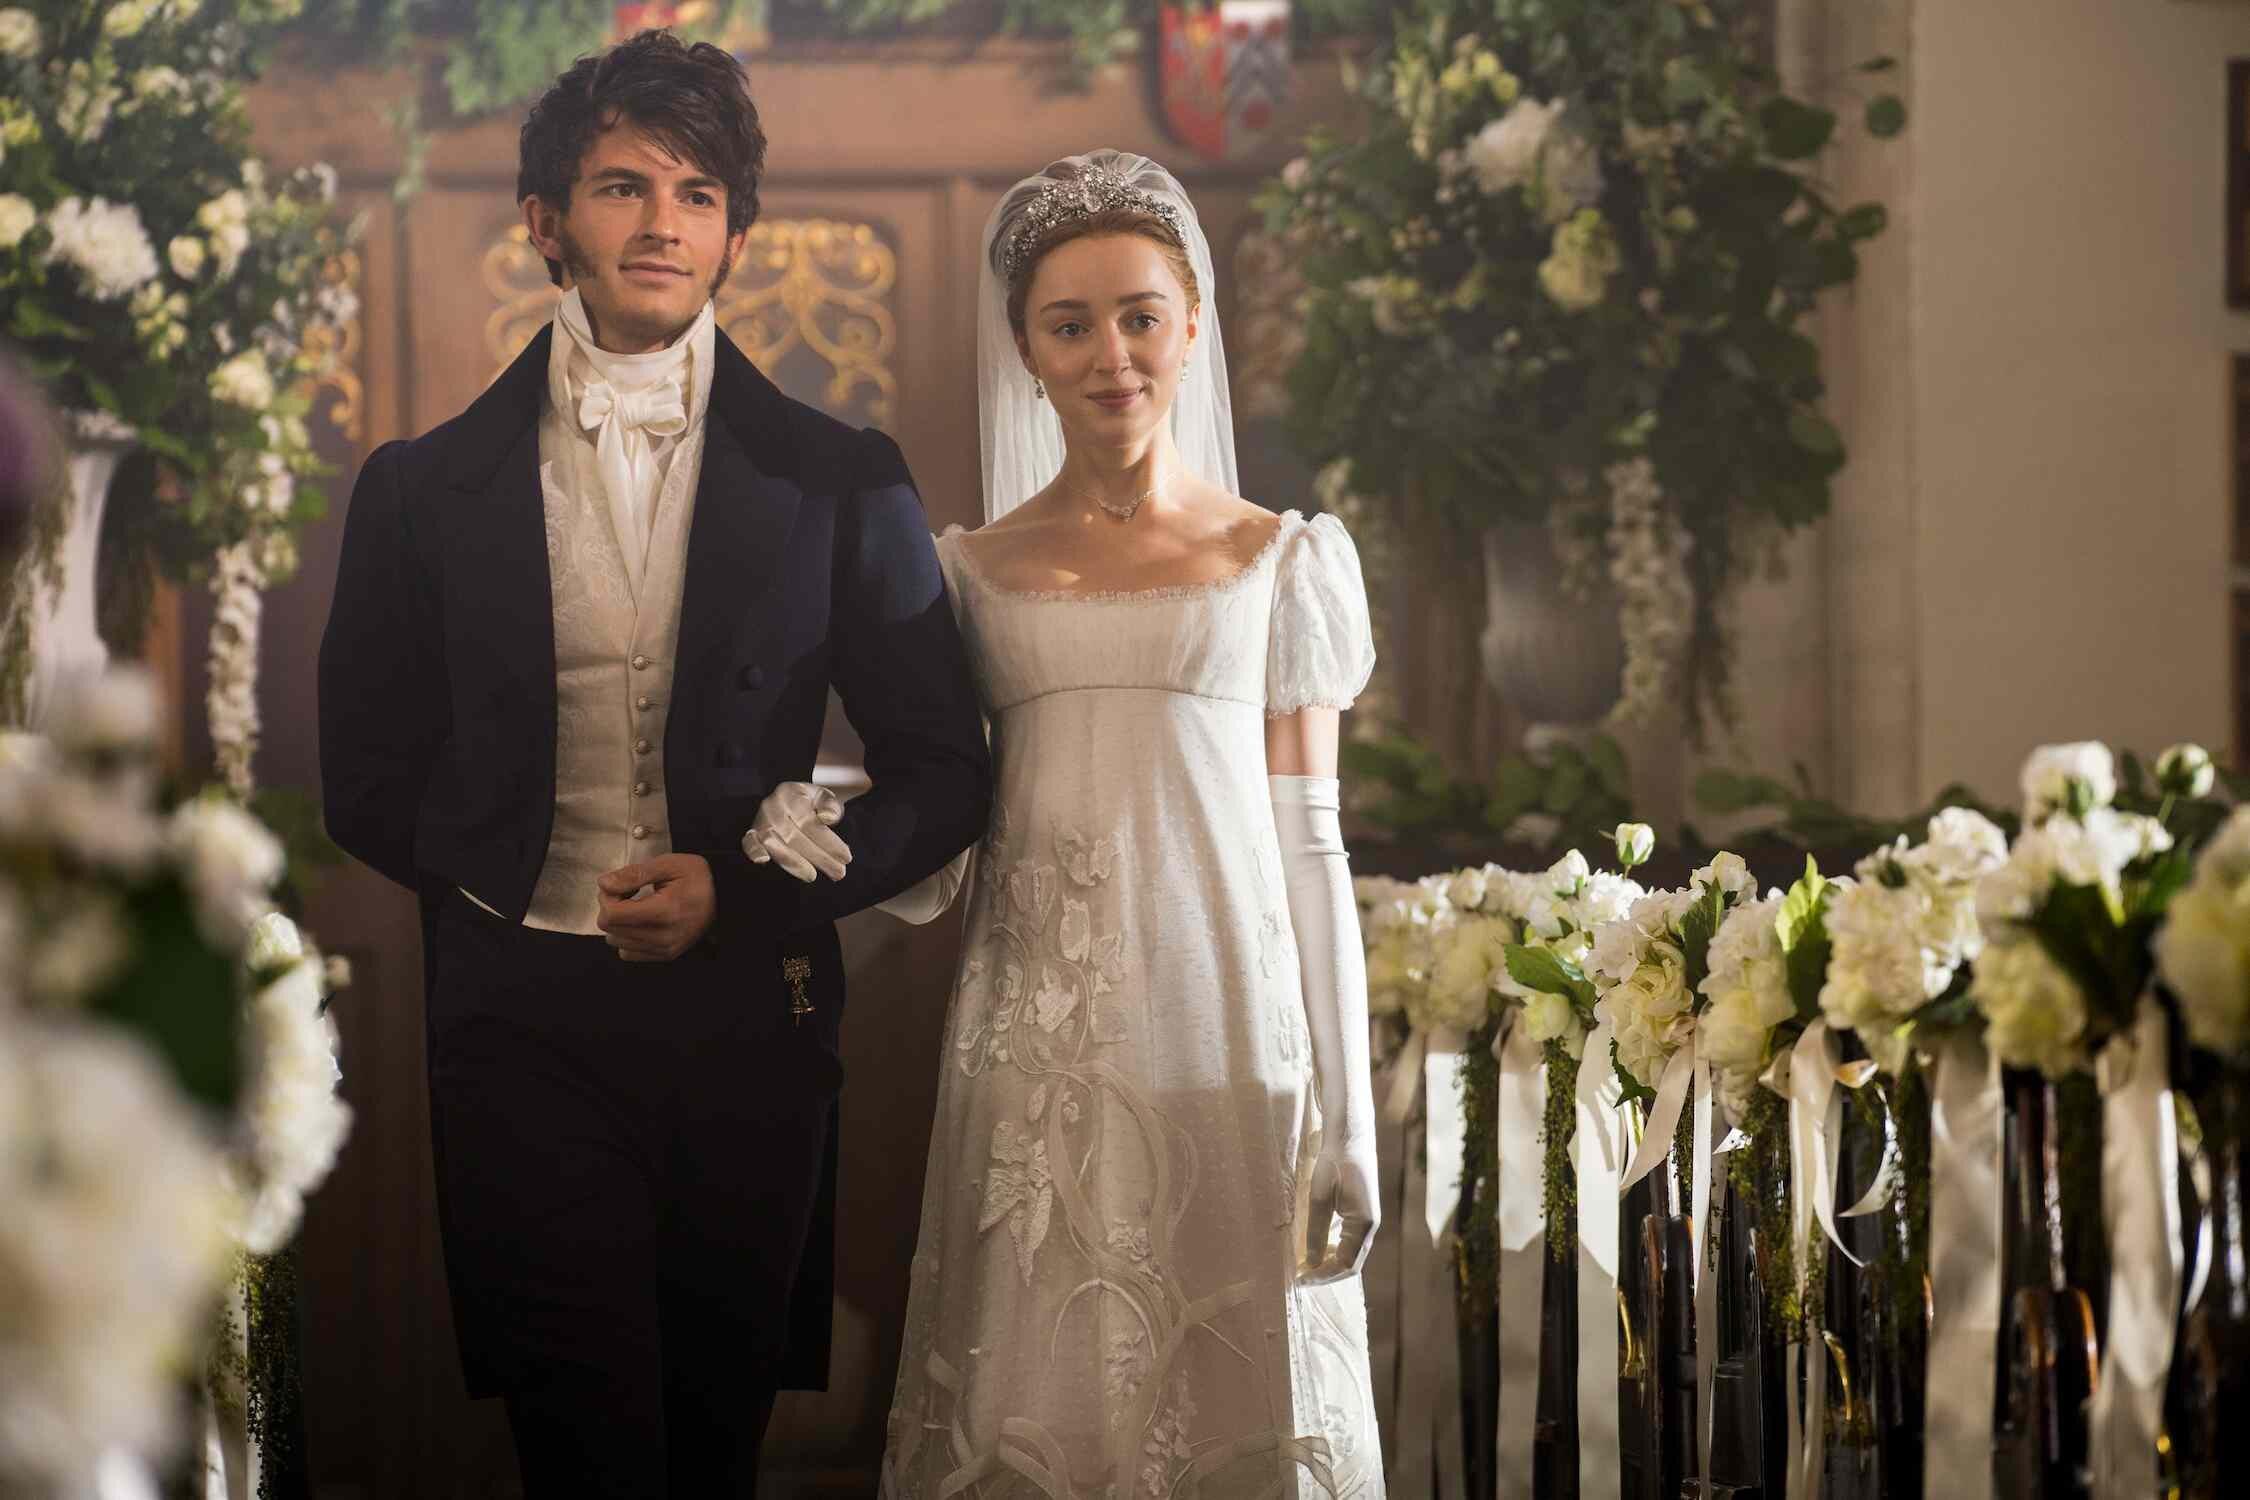 wedding inspiration from bridgerton